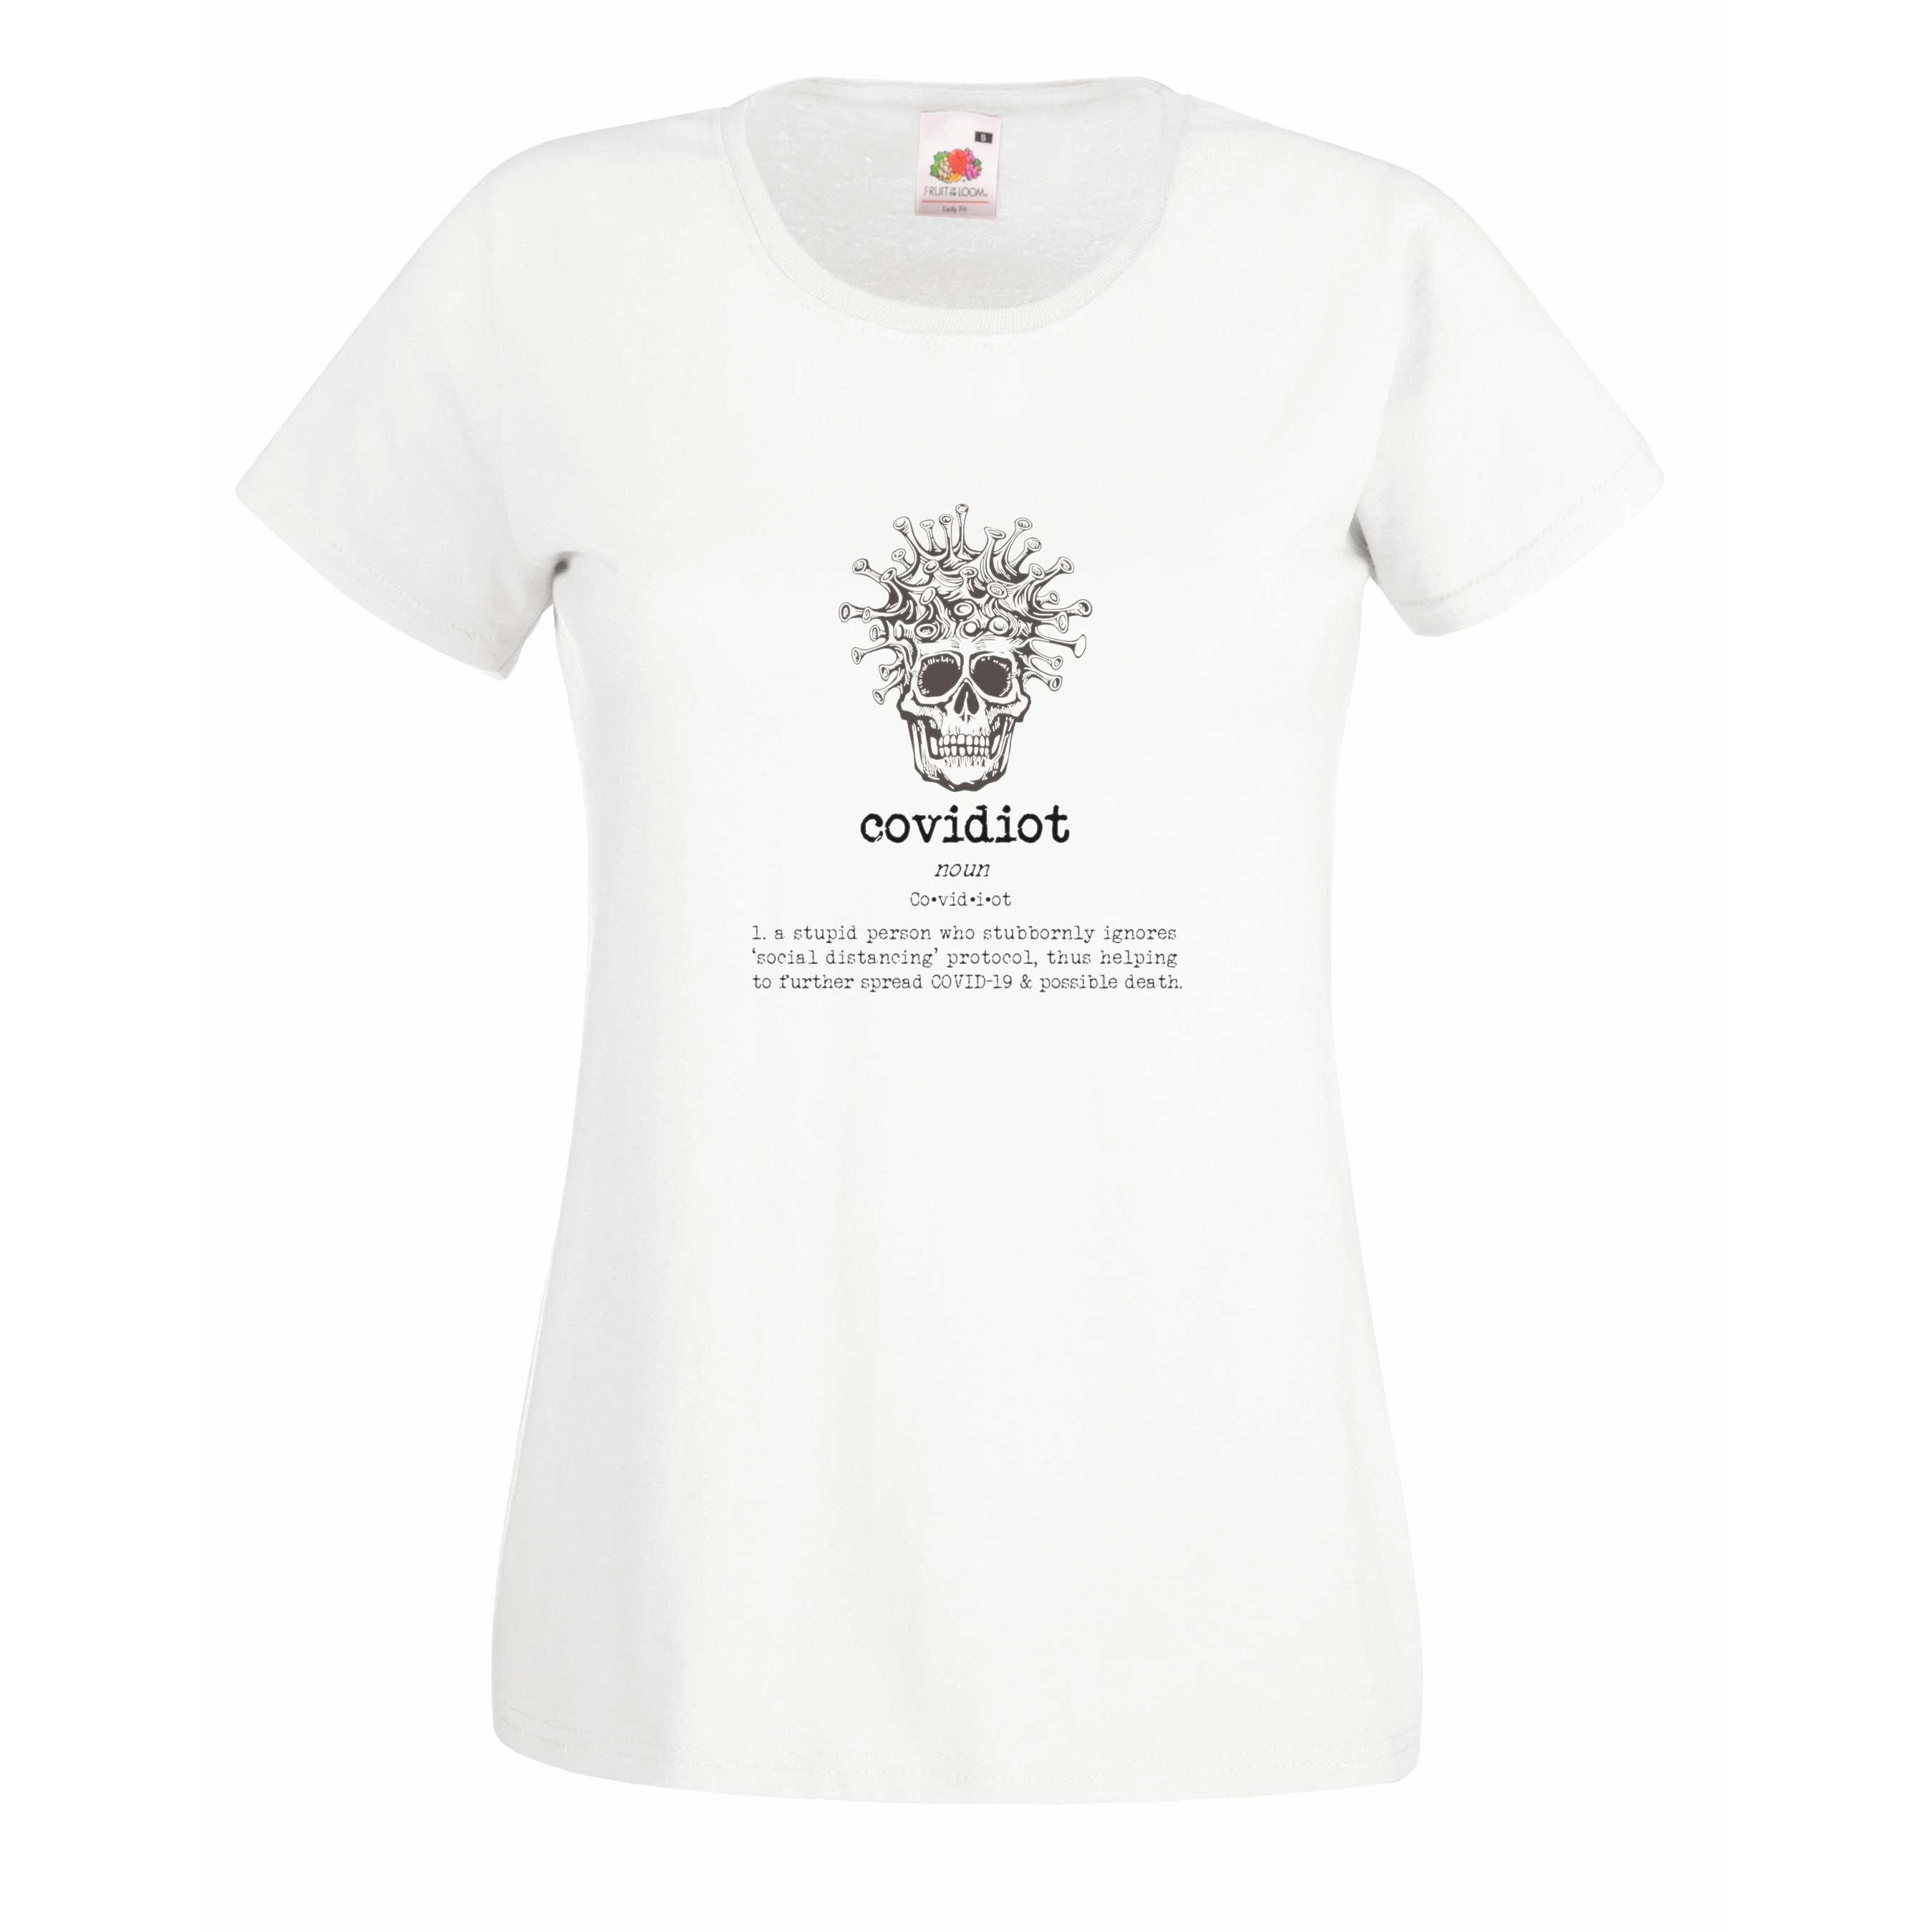 Covidiot 2 design for t-shirt, hoodie & sweatshirt